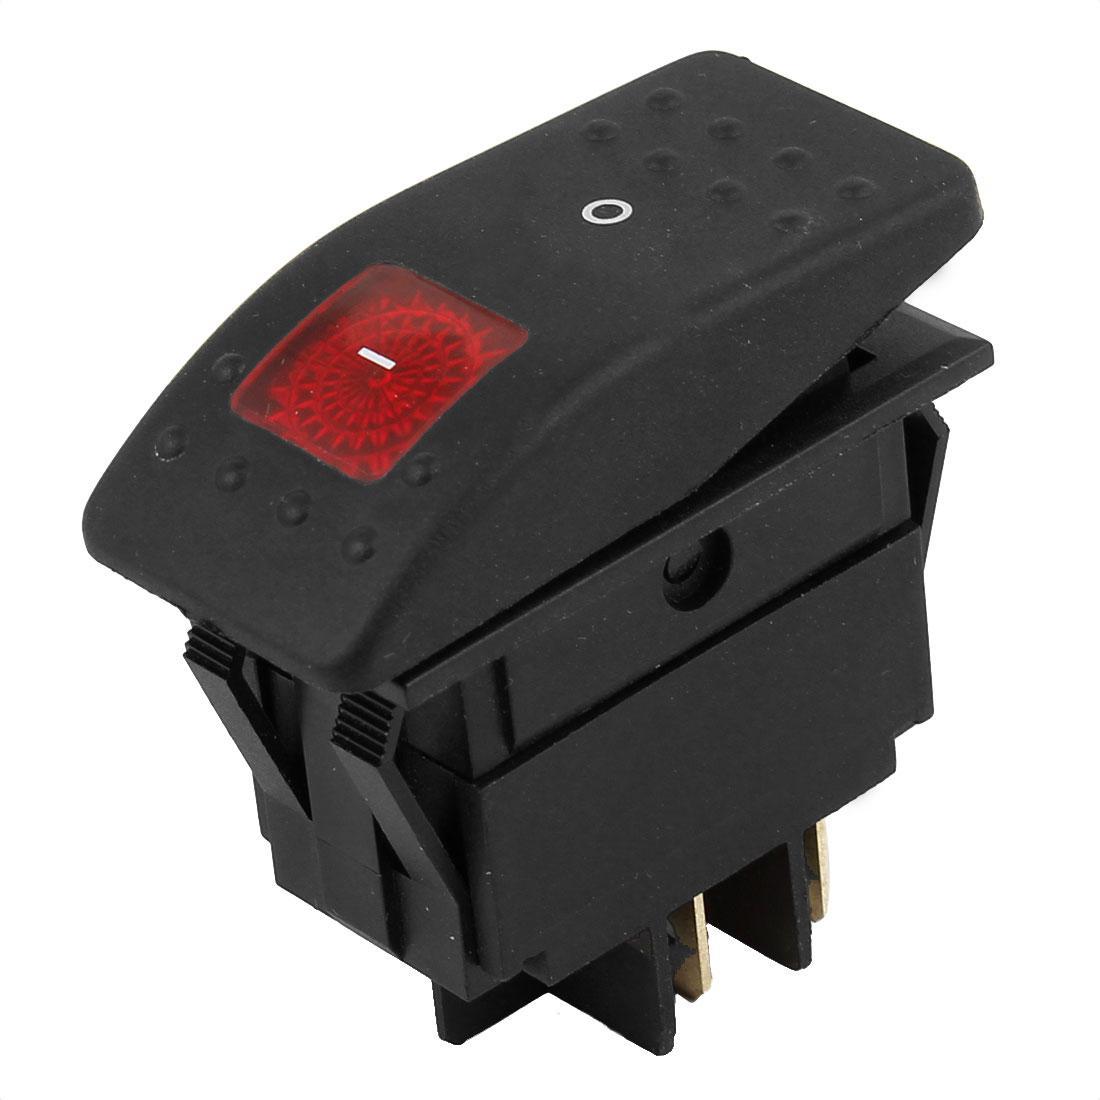 2018 Dpst 4 Pin Jeep Car Fog Lignt Boat Rocker Switch Button Dc 12v ...